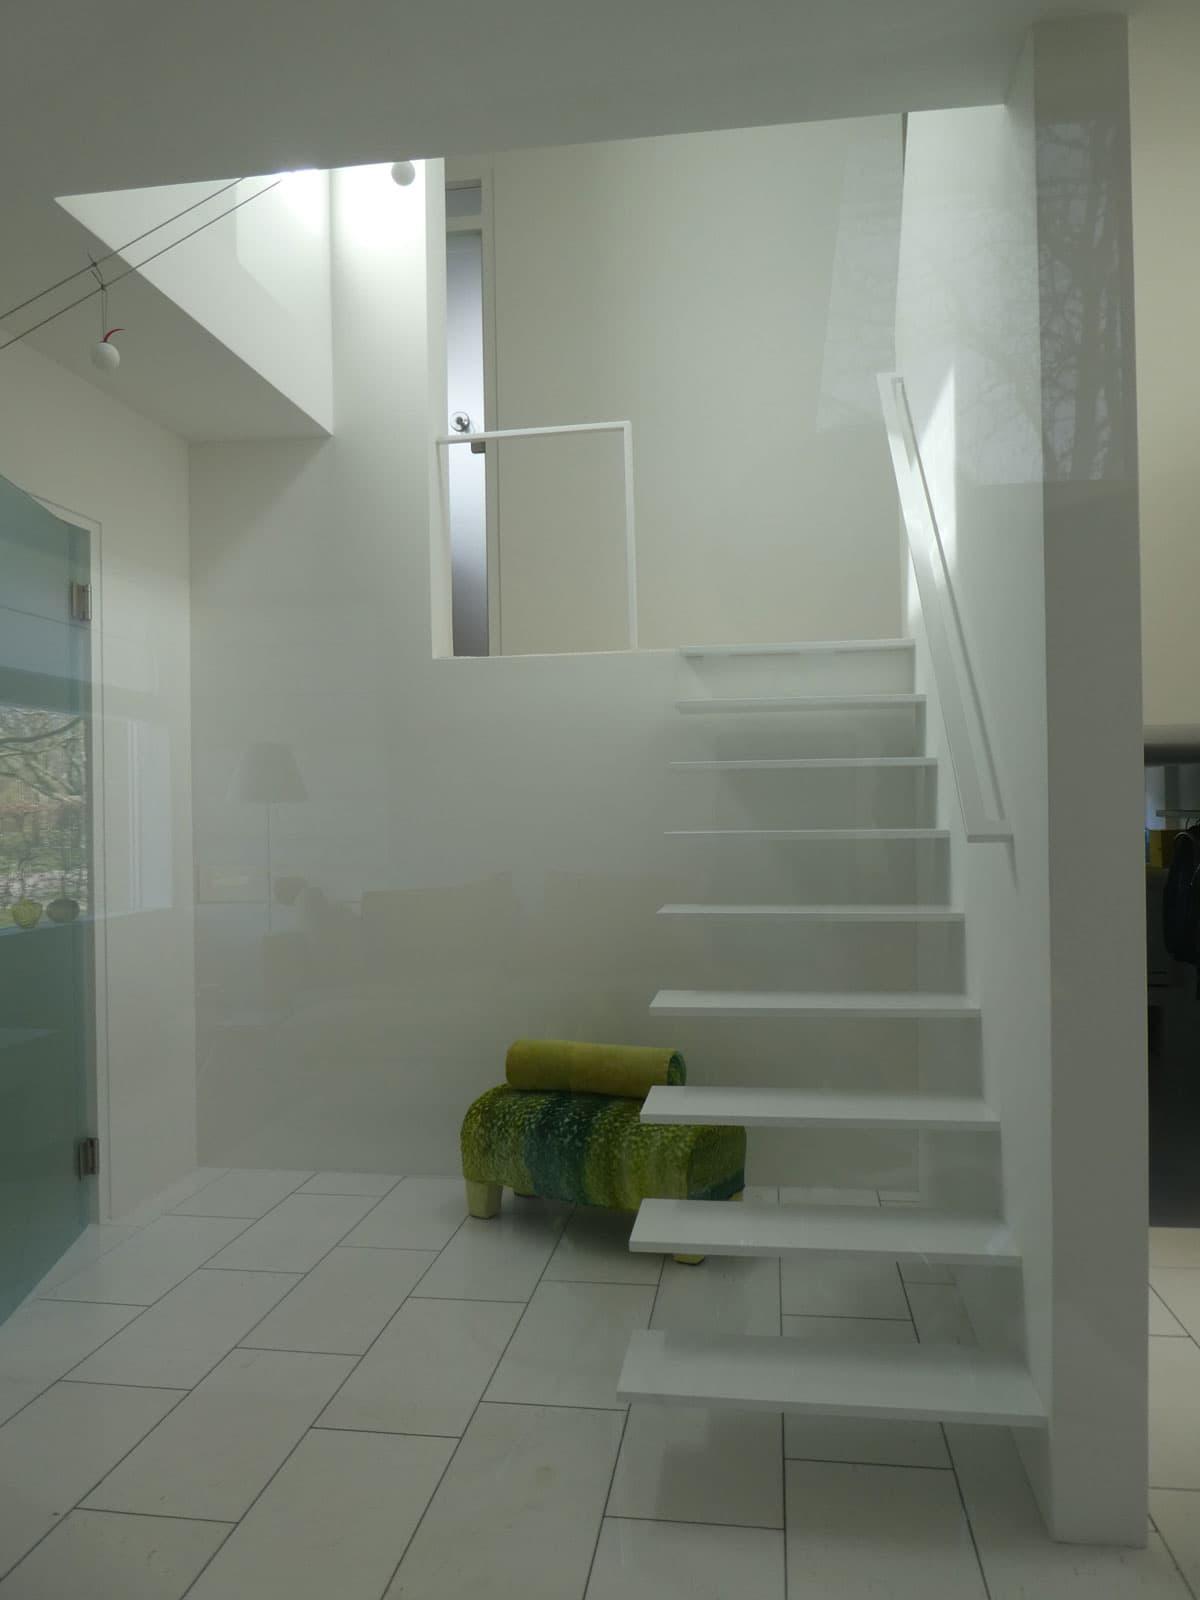 zt19b zwevende trap